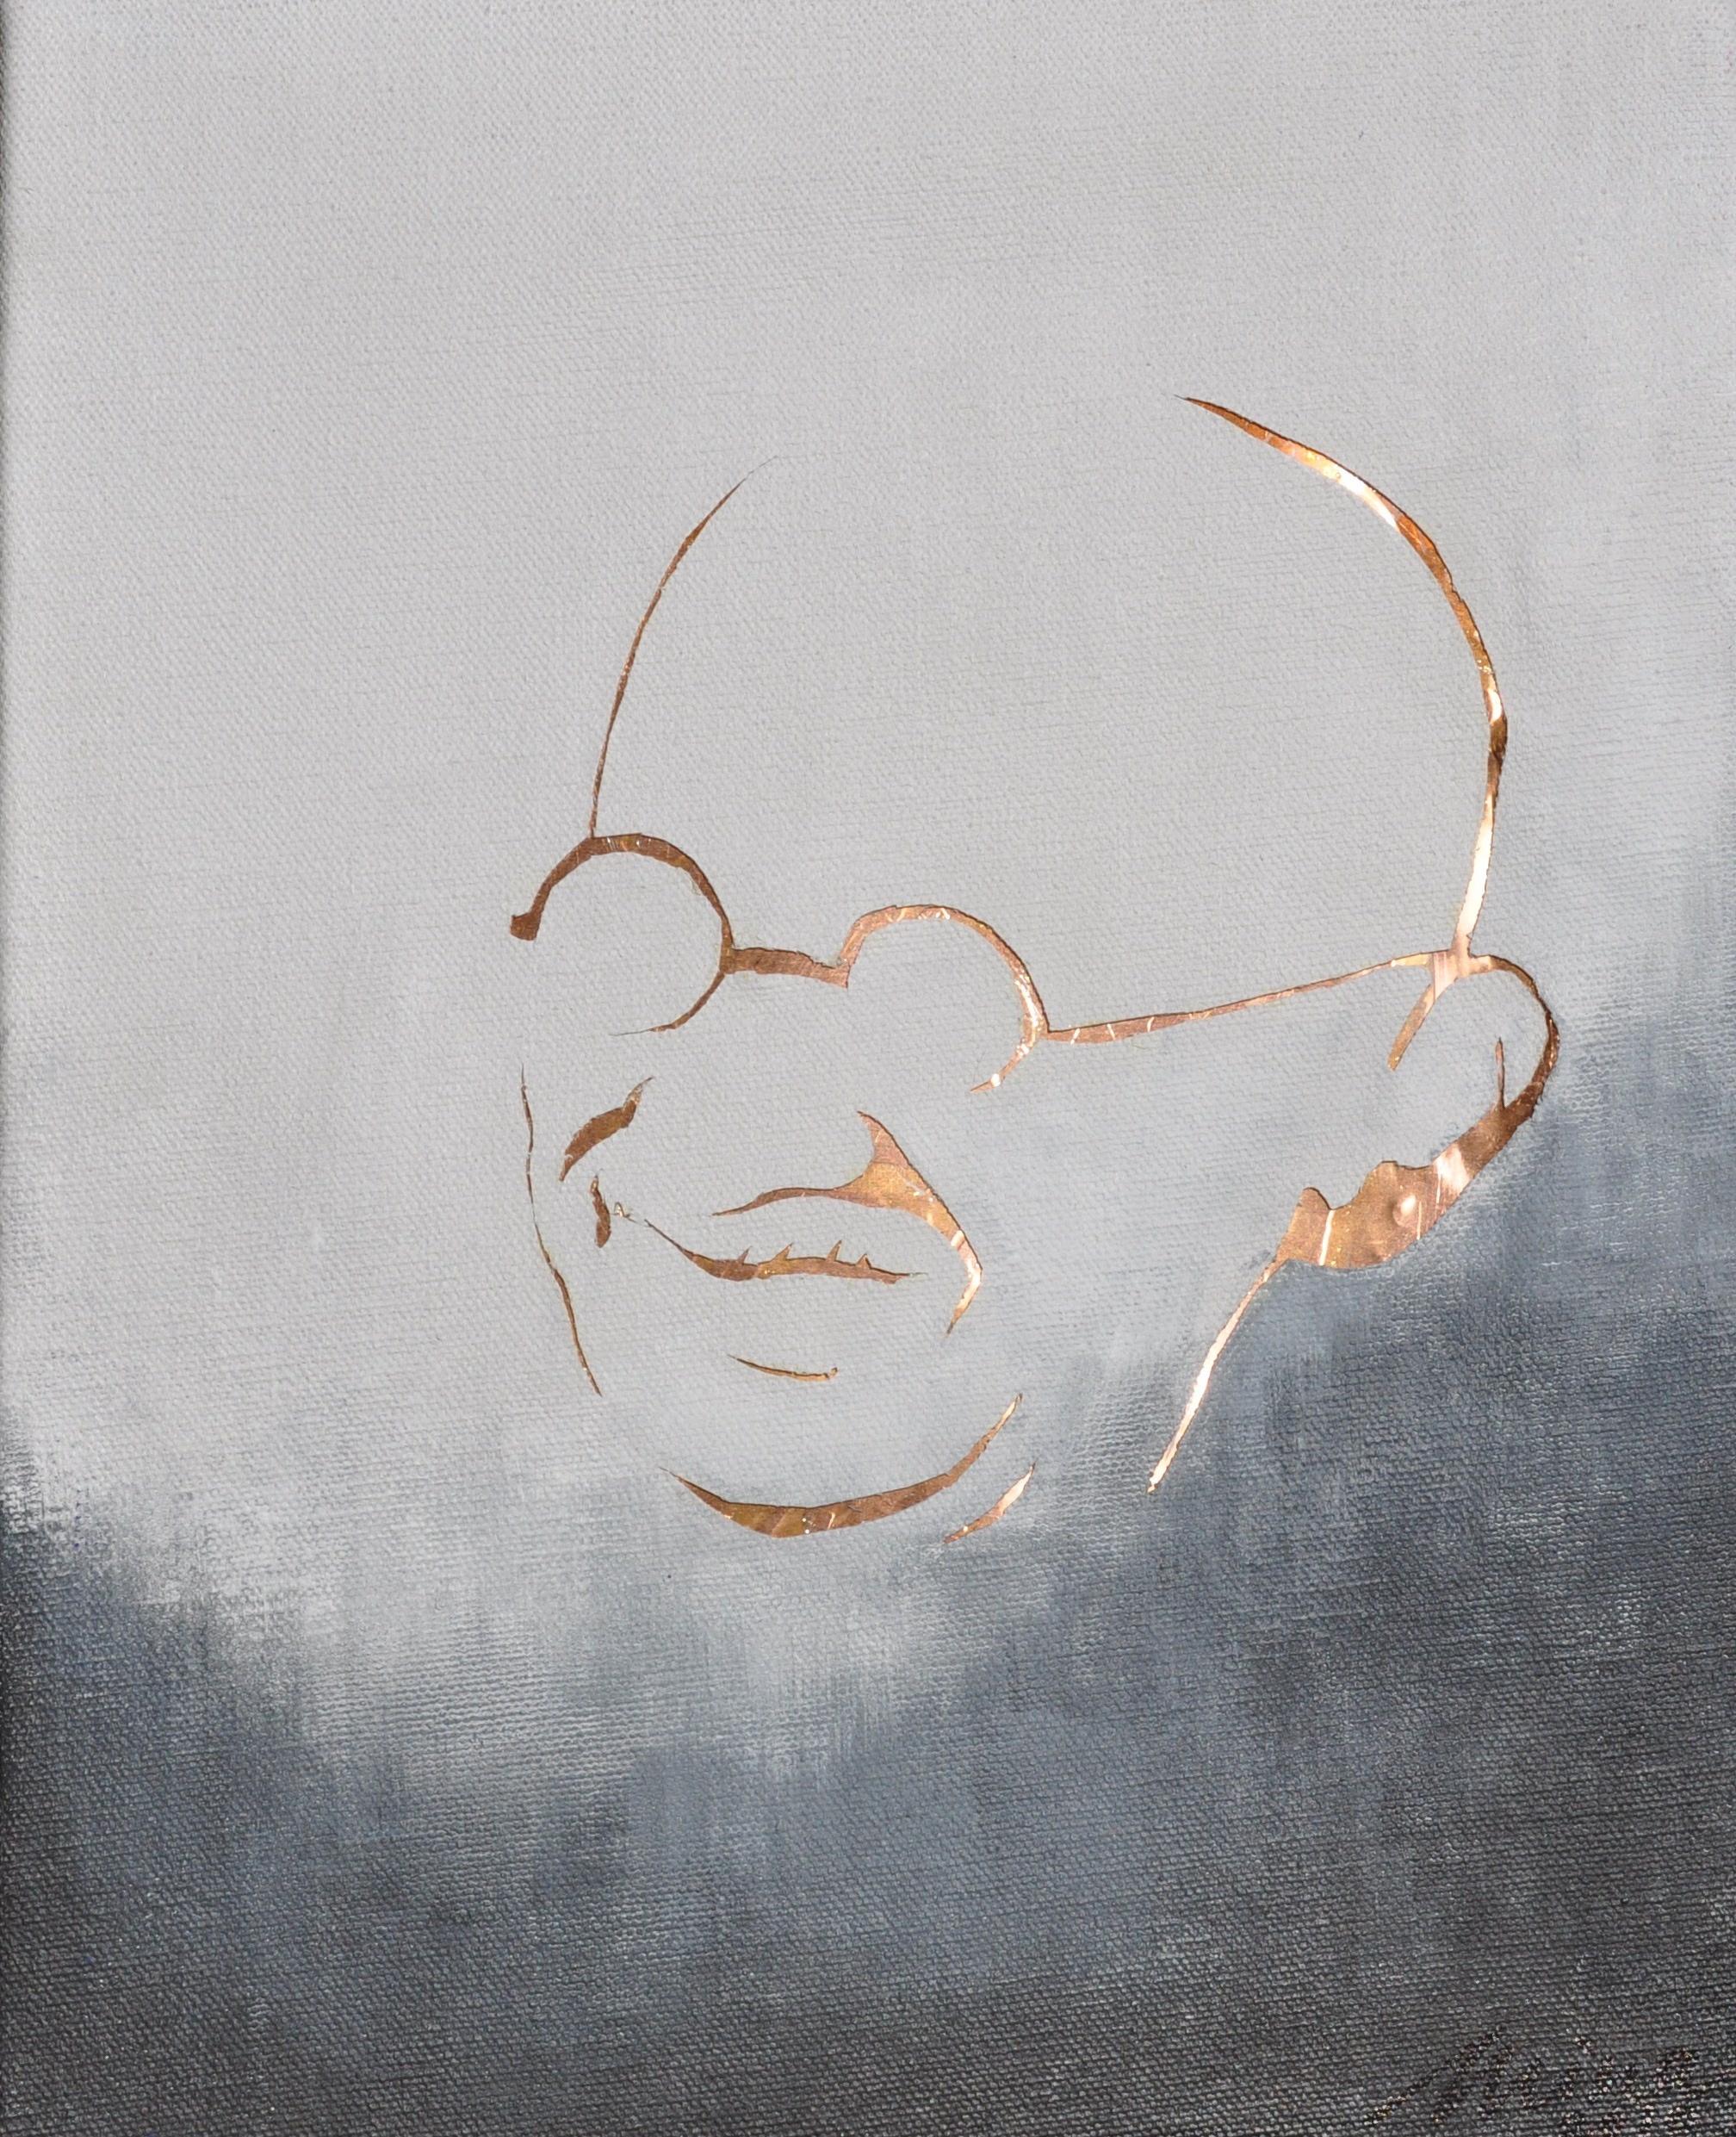 Gandhiji, from Darkness to Light